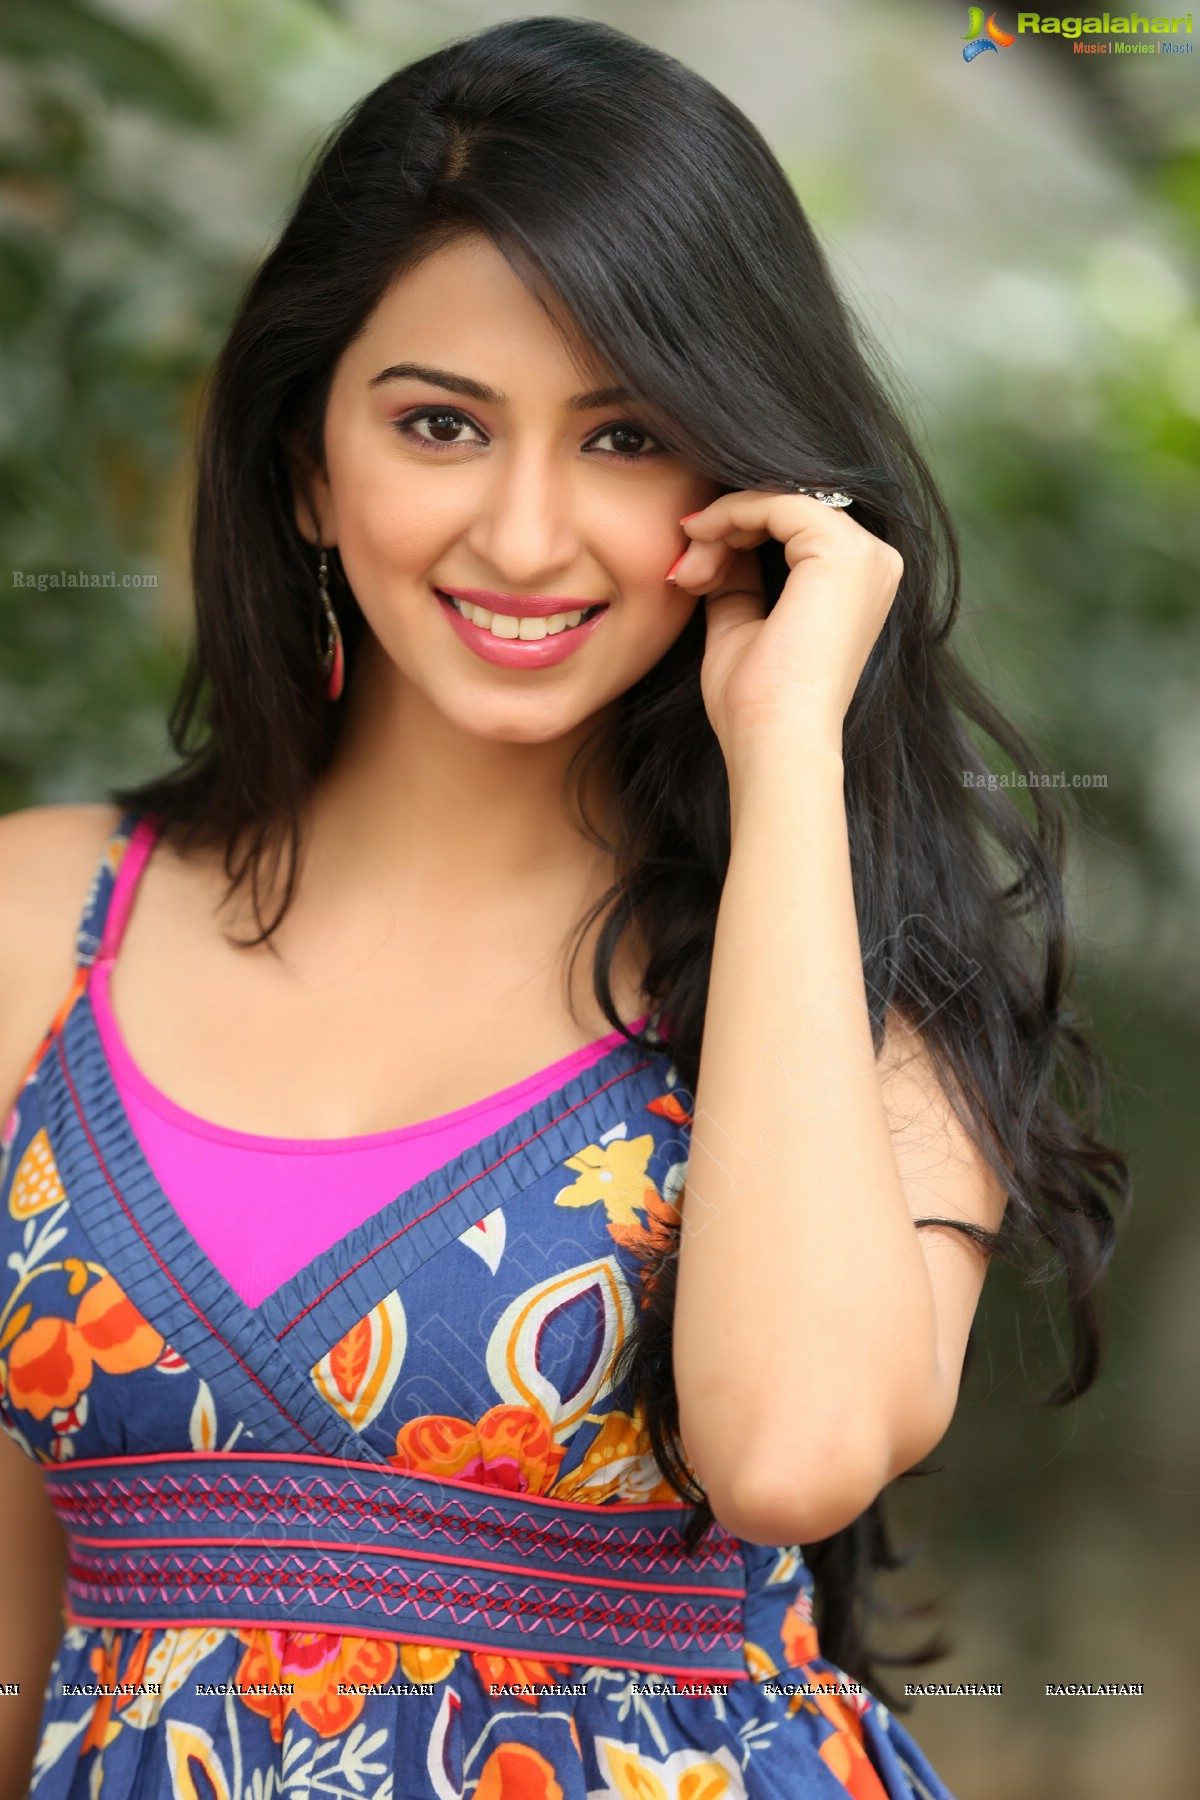 Eshanya Ankita Maheswari Exclusive Image 45 Telugu Heroines